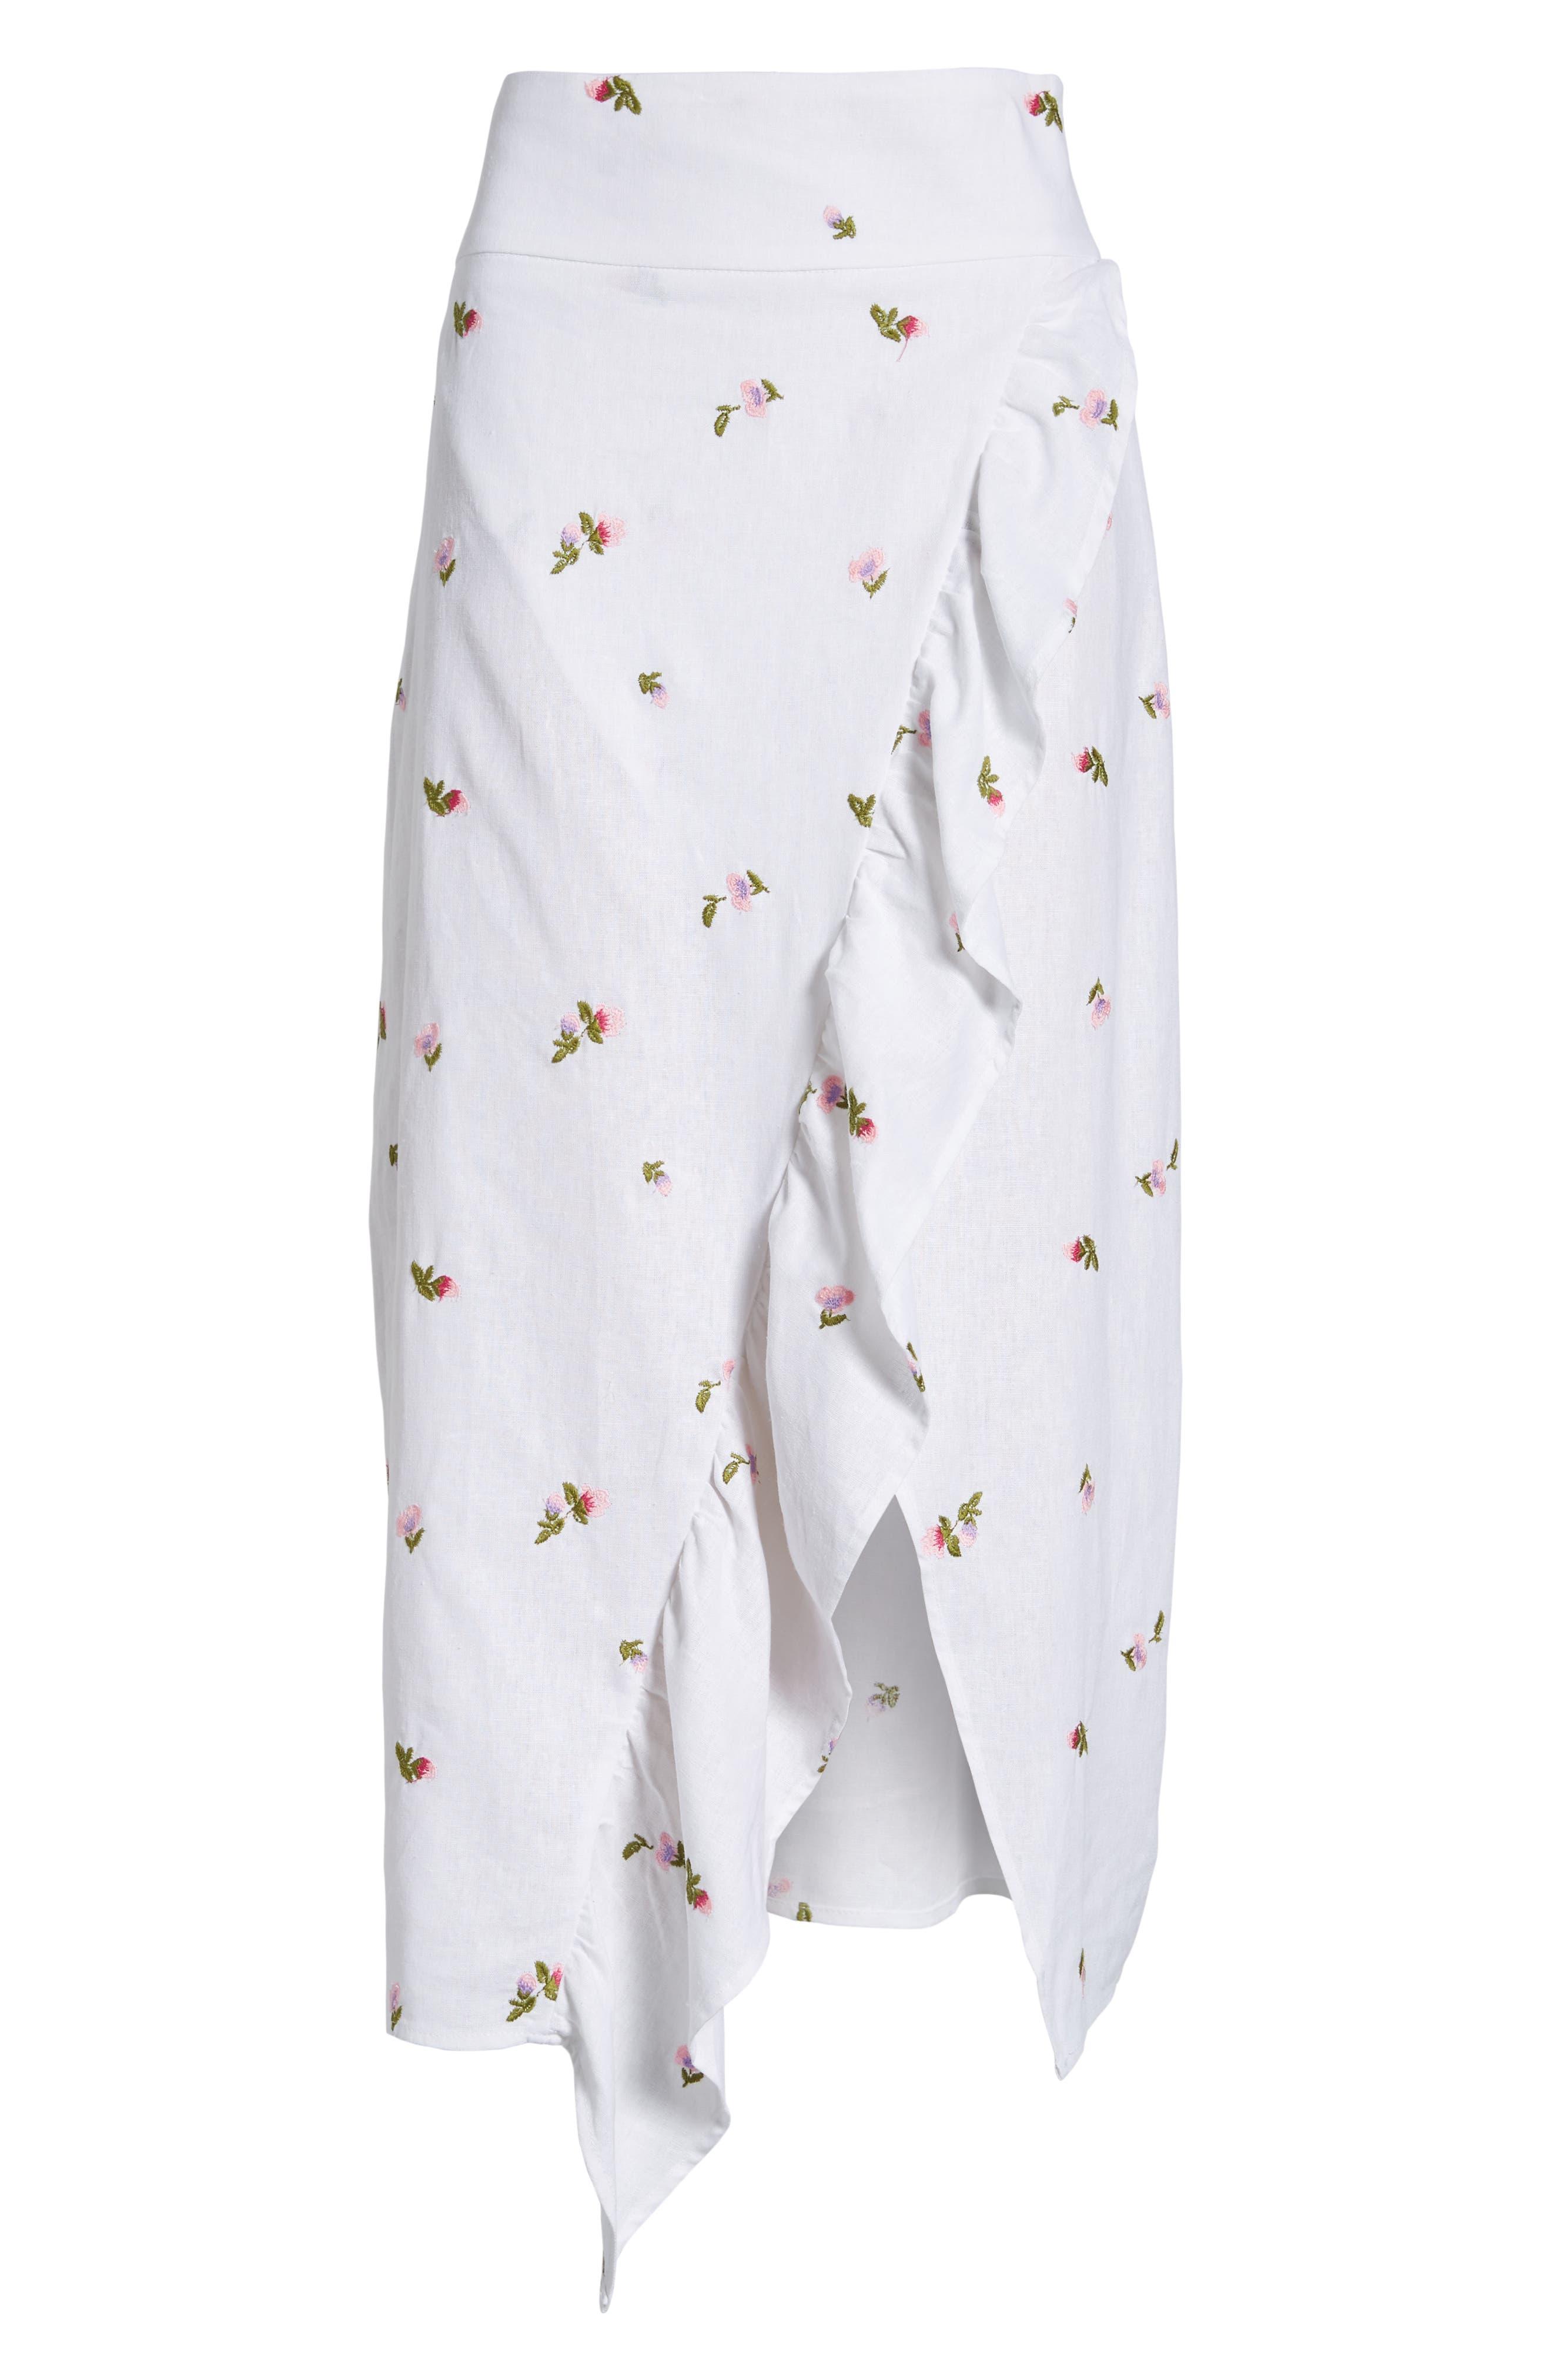 Sunset Midi Skirt,                             Alternate thumbnail 6, color,                             Ditsy Embroidery